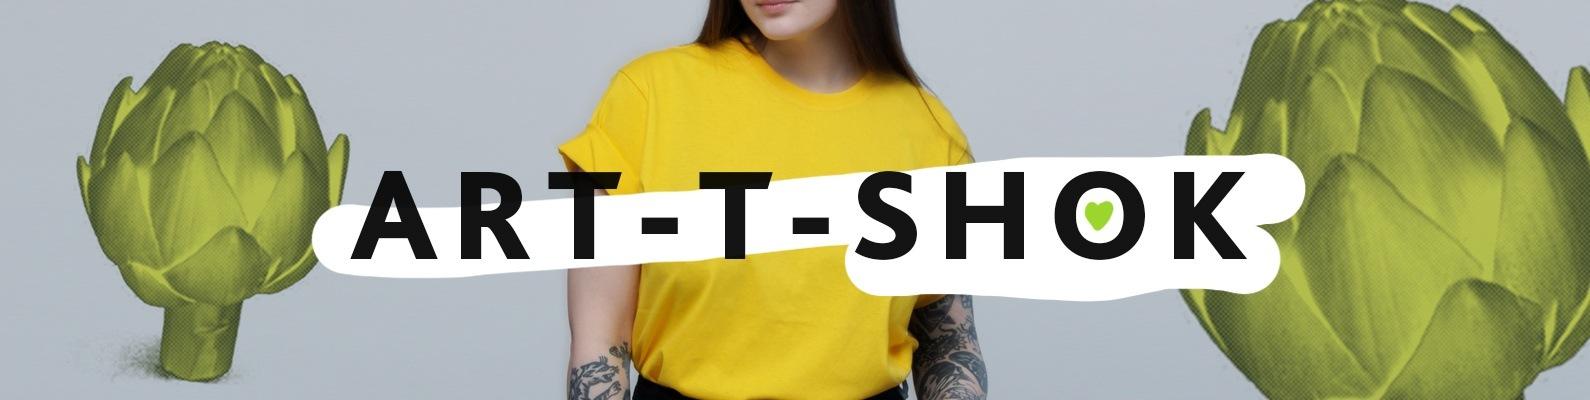 f4f7eca0e65f3 ART-T-SHOK - печать на футболках и свитшотах   ВКонтакте